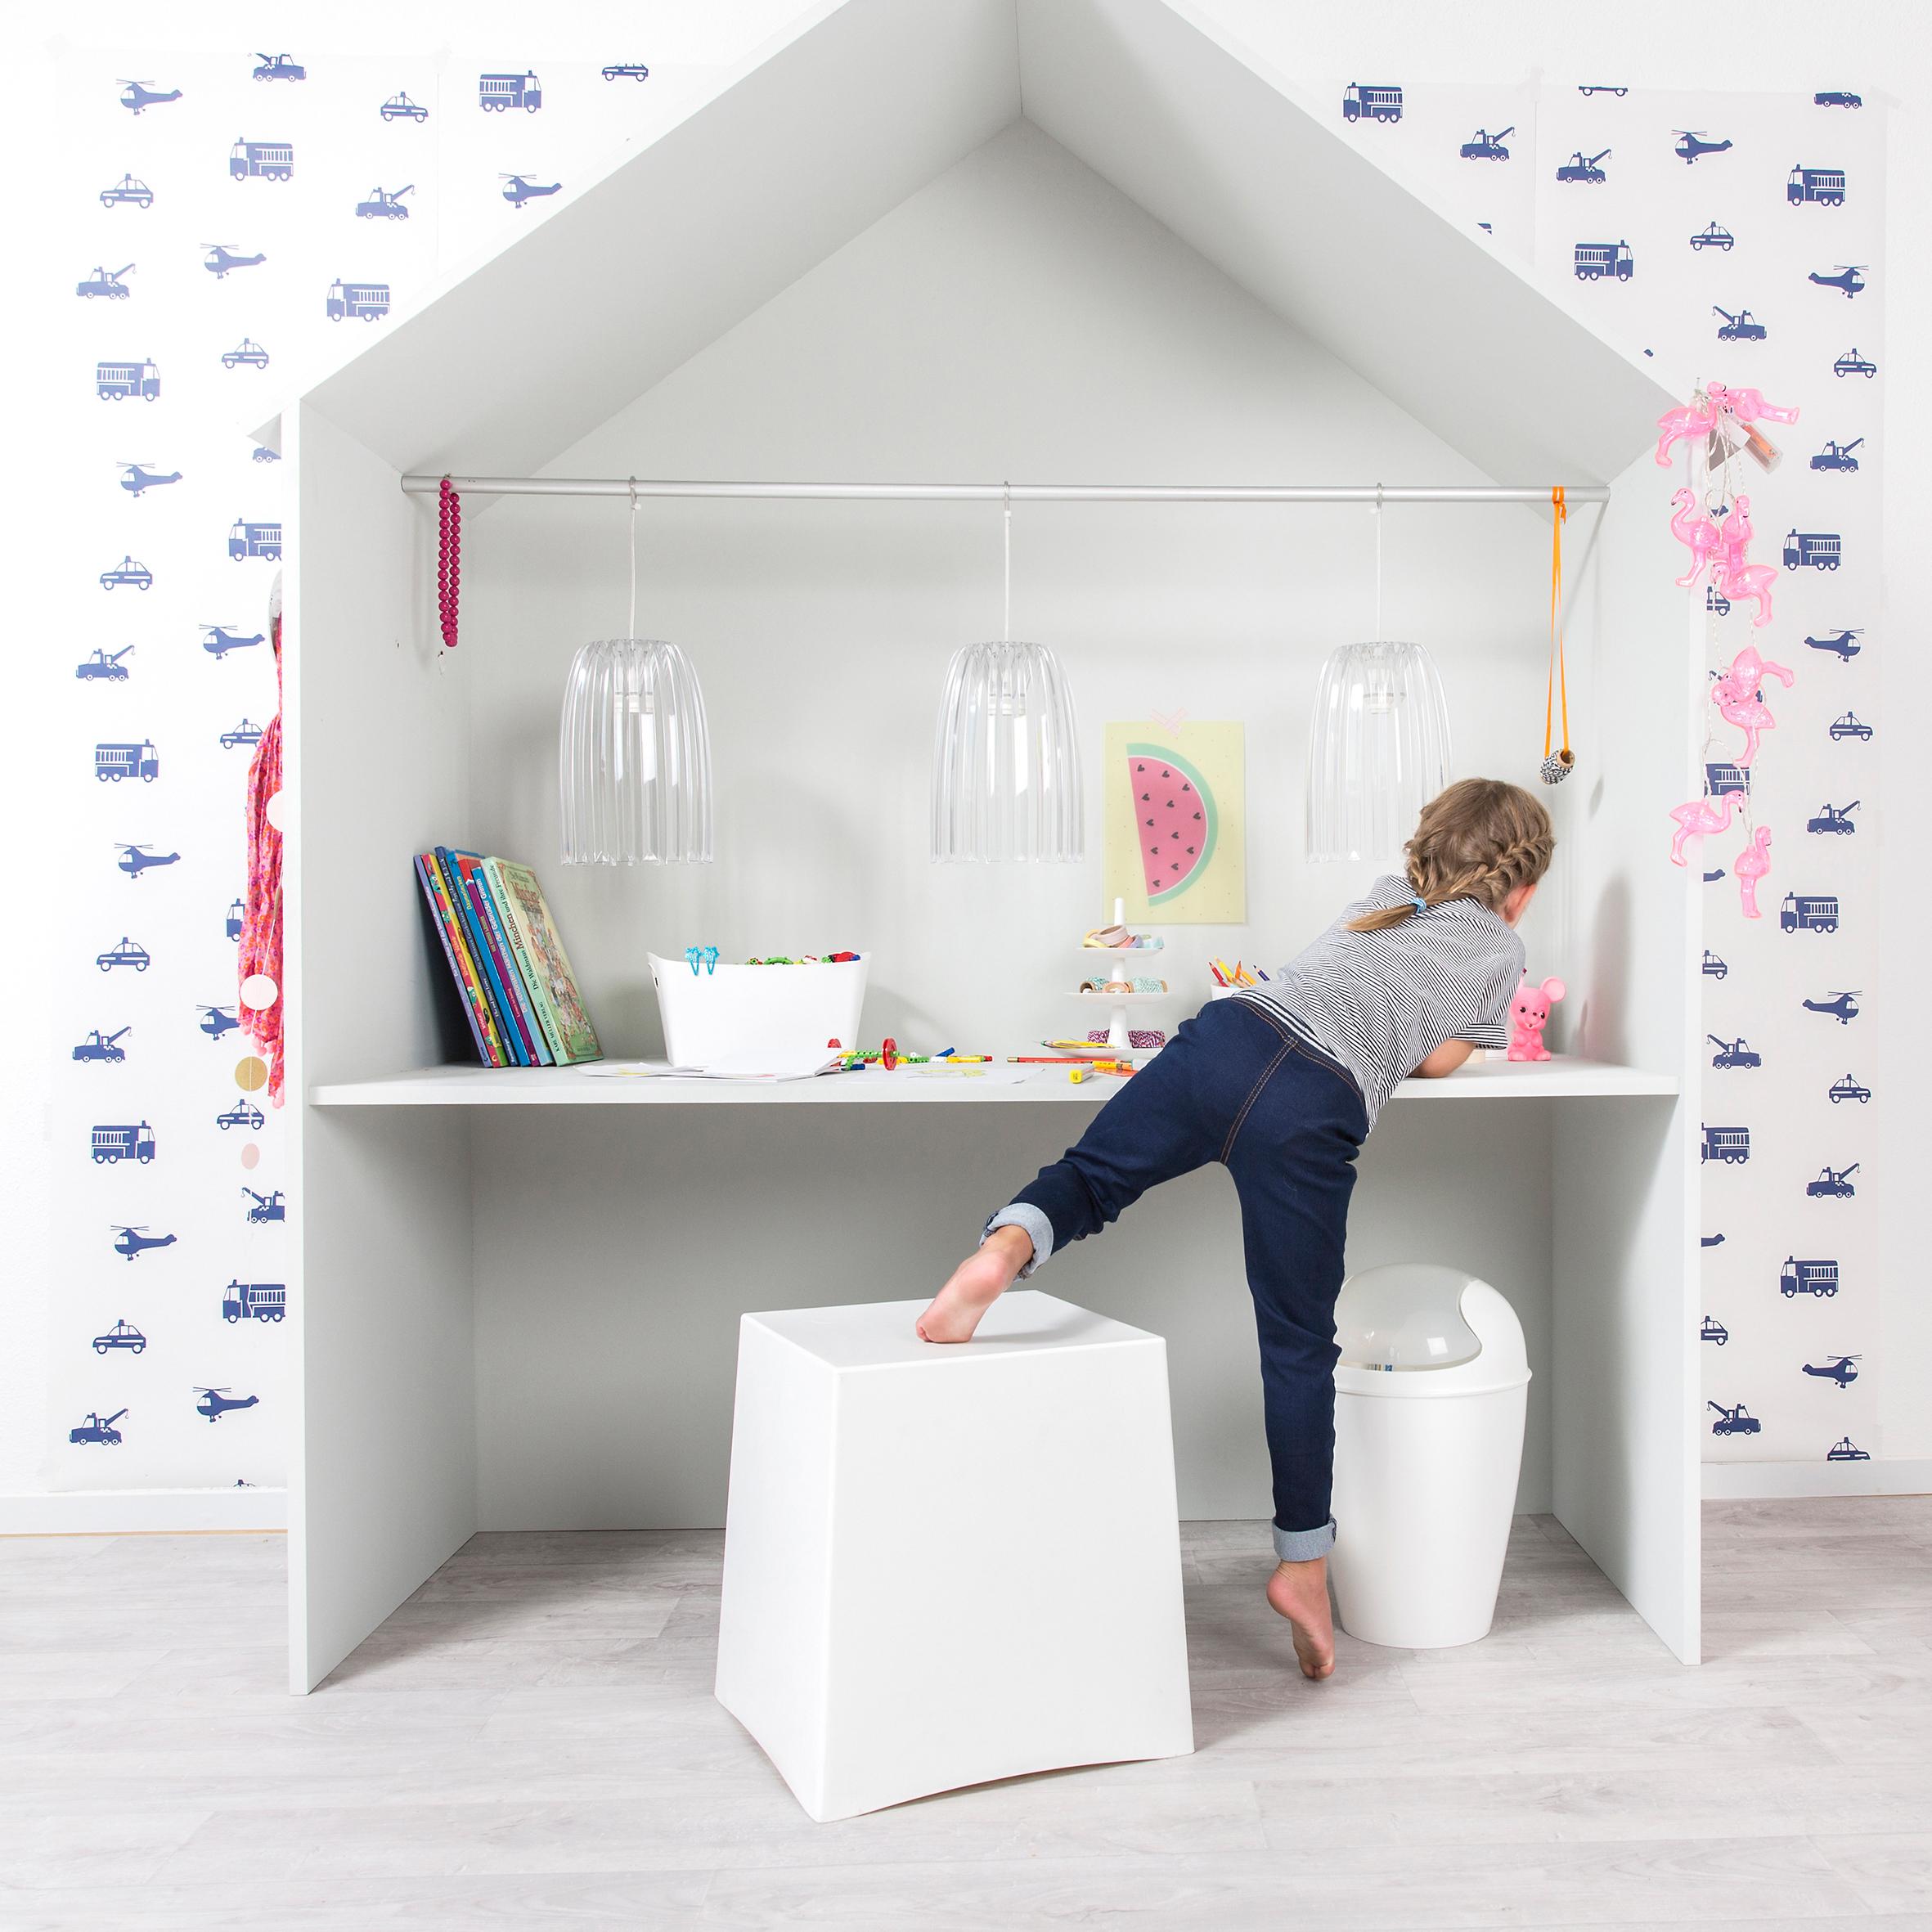 koziol ideas for friends gmbh briq stool powder pink. Black Bedroom Furniture Sets. Home Design Ideas